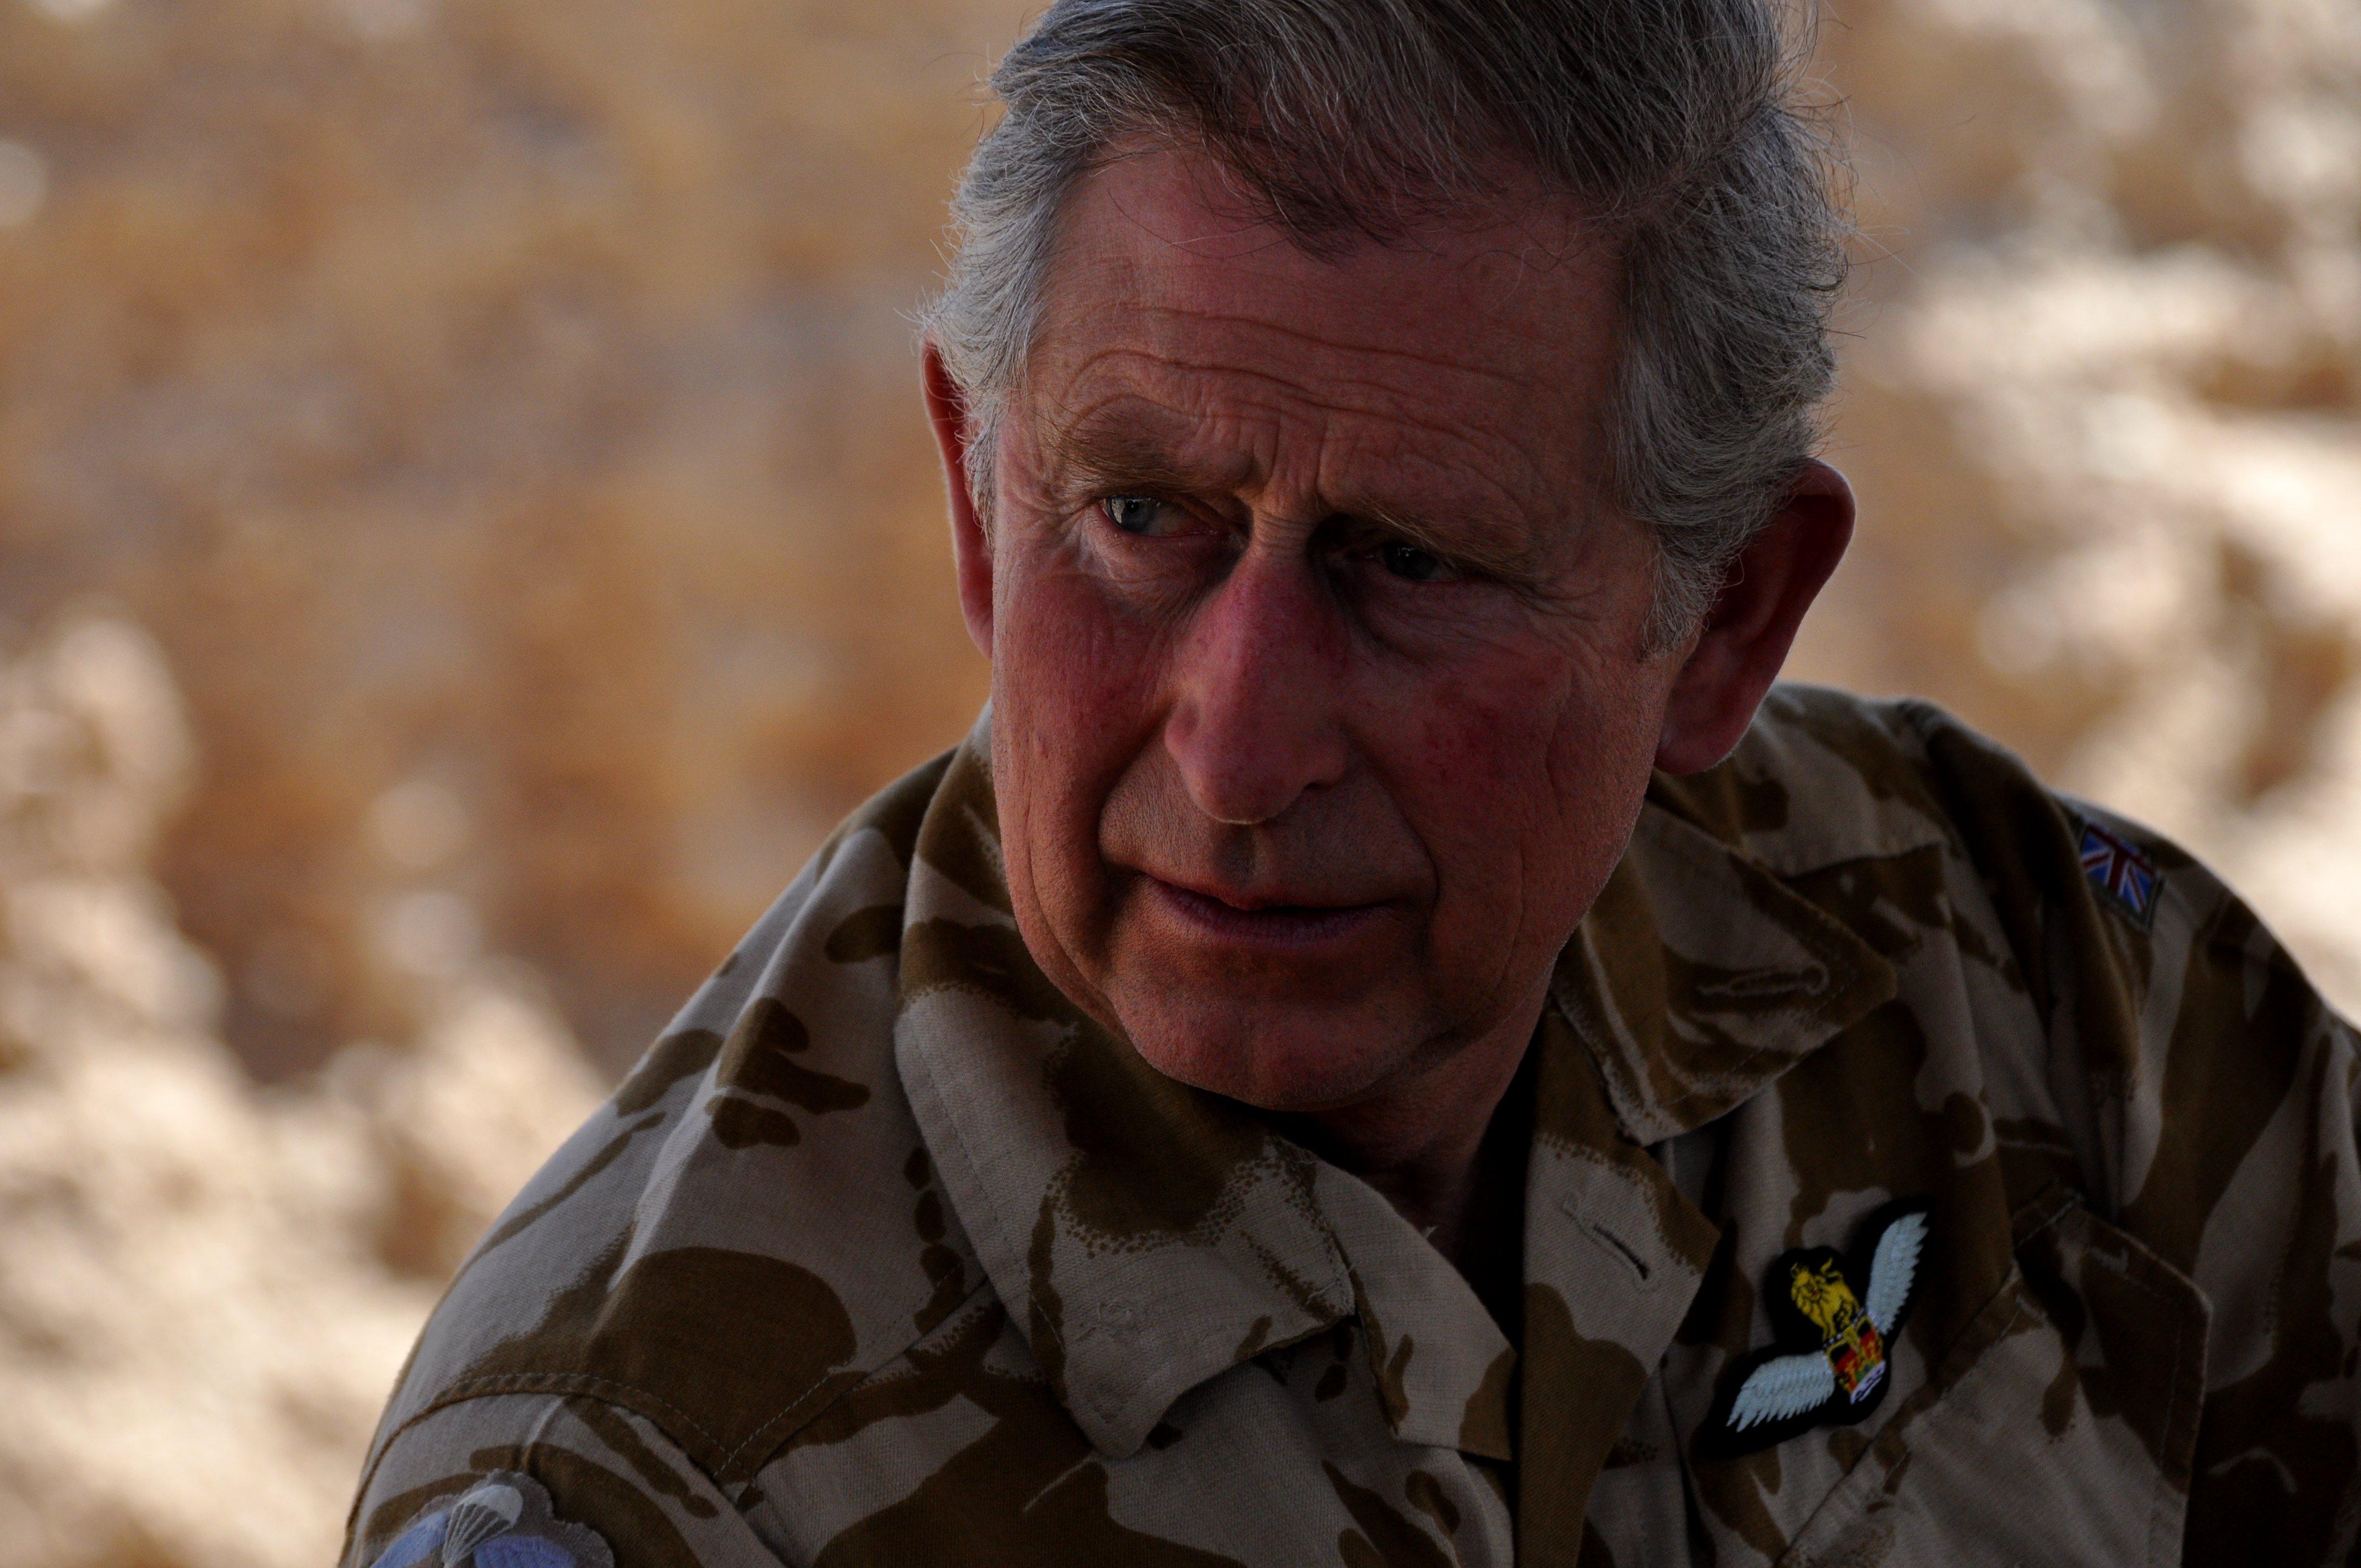 HRH Prince Charles, The Prince of Wales.  Photo by Helmandblog.